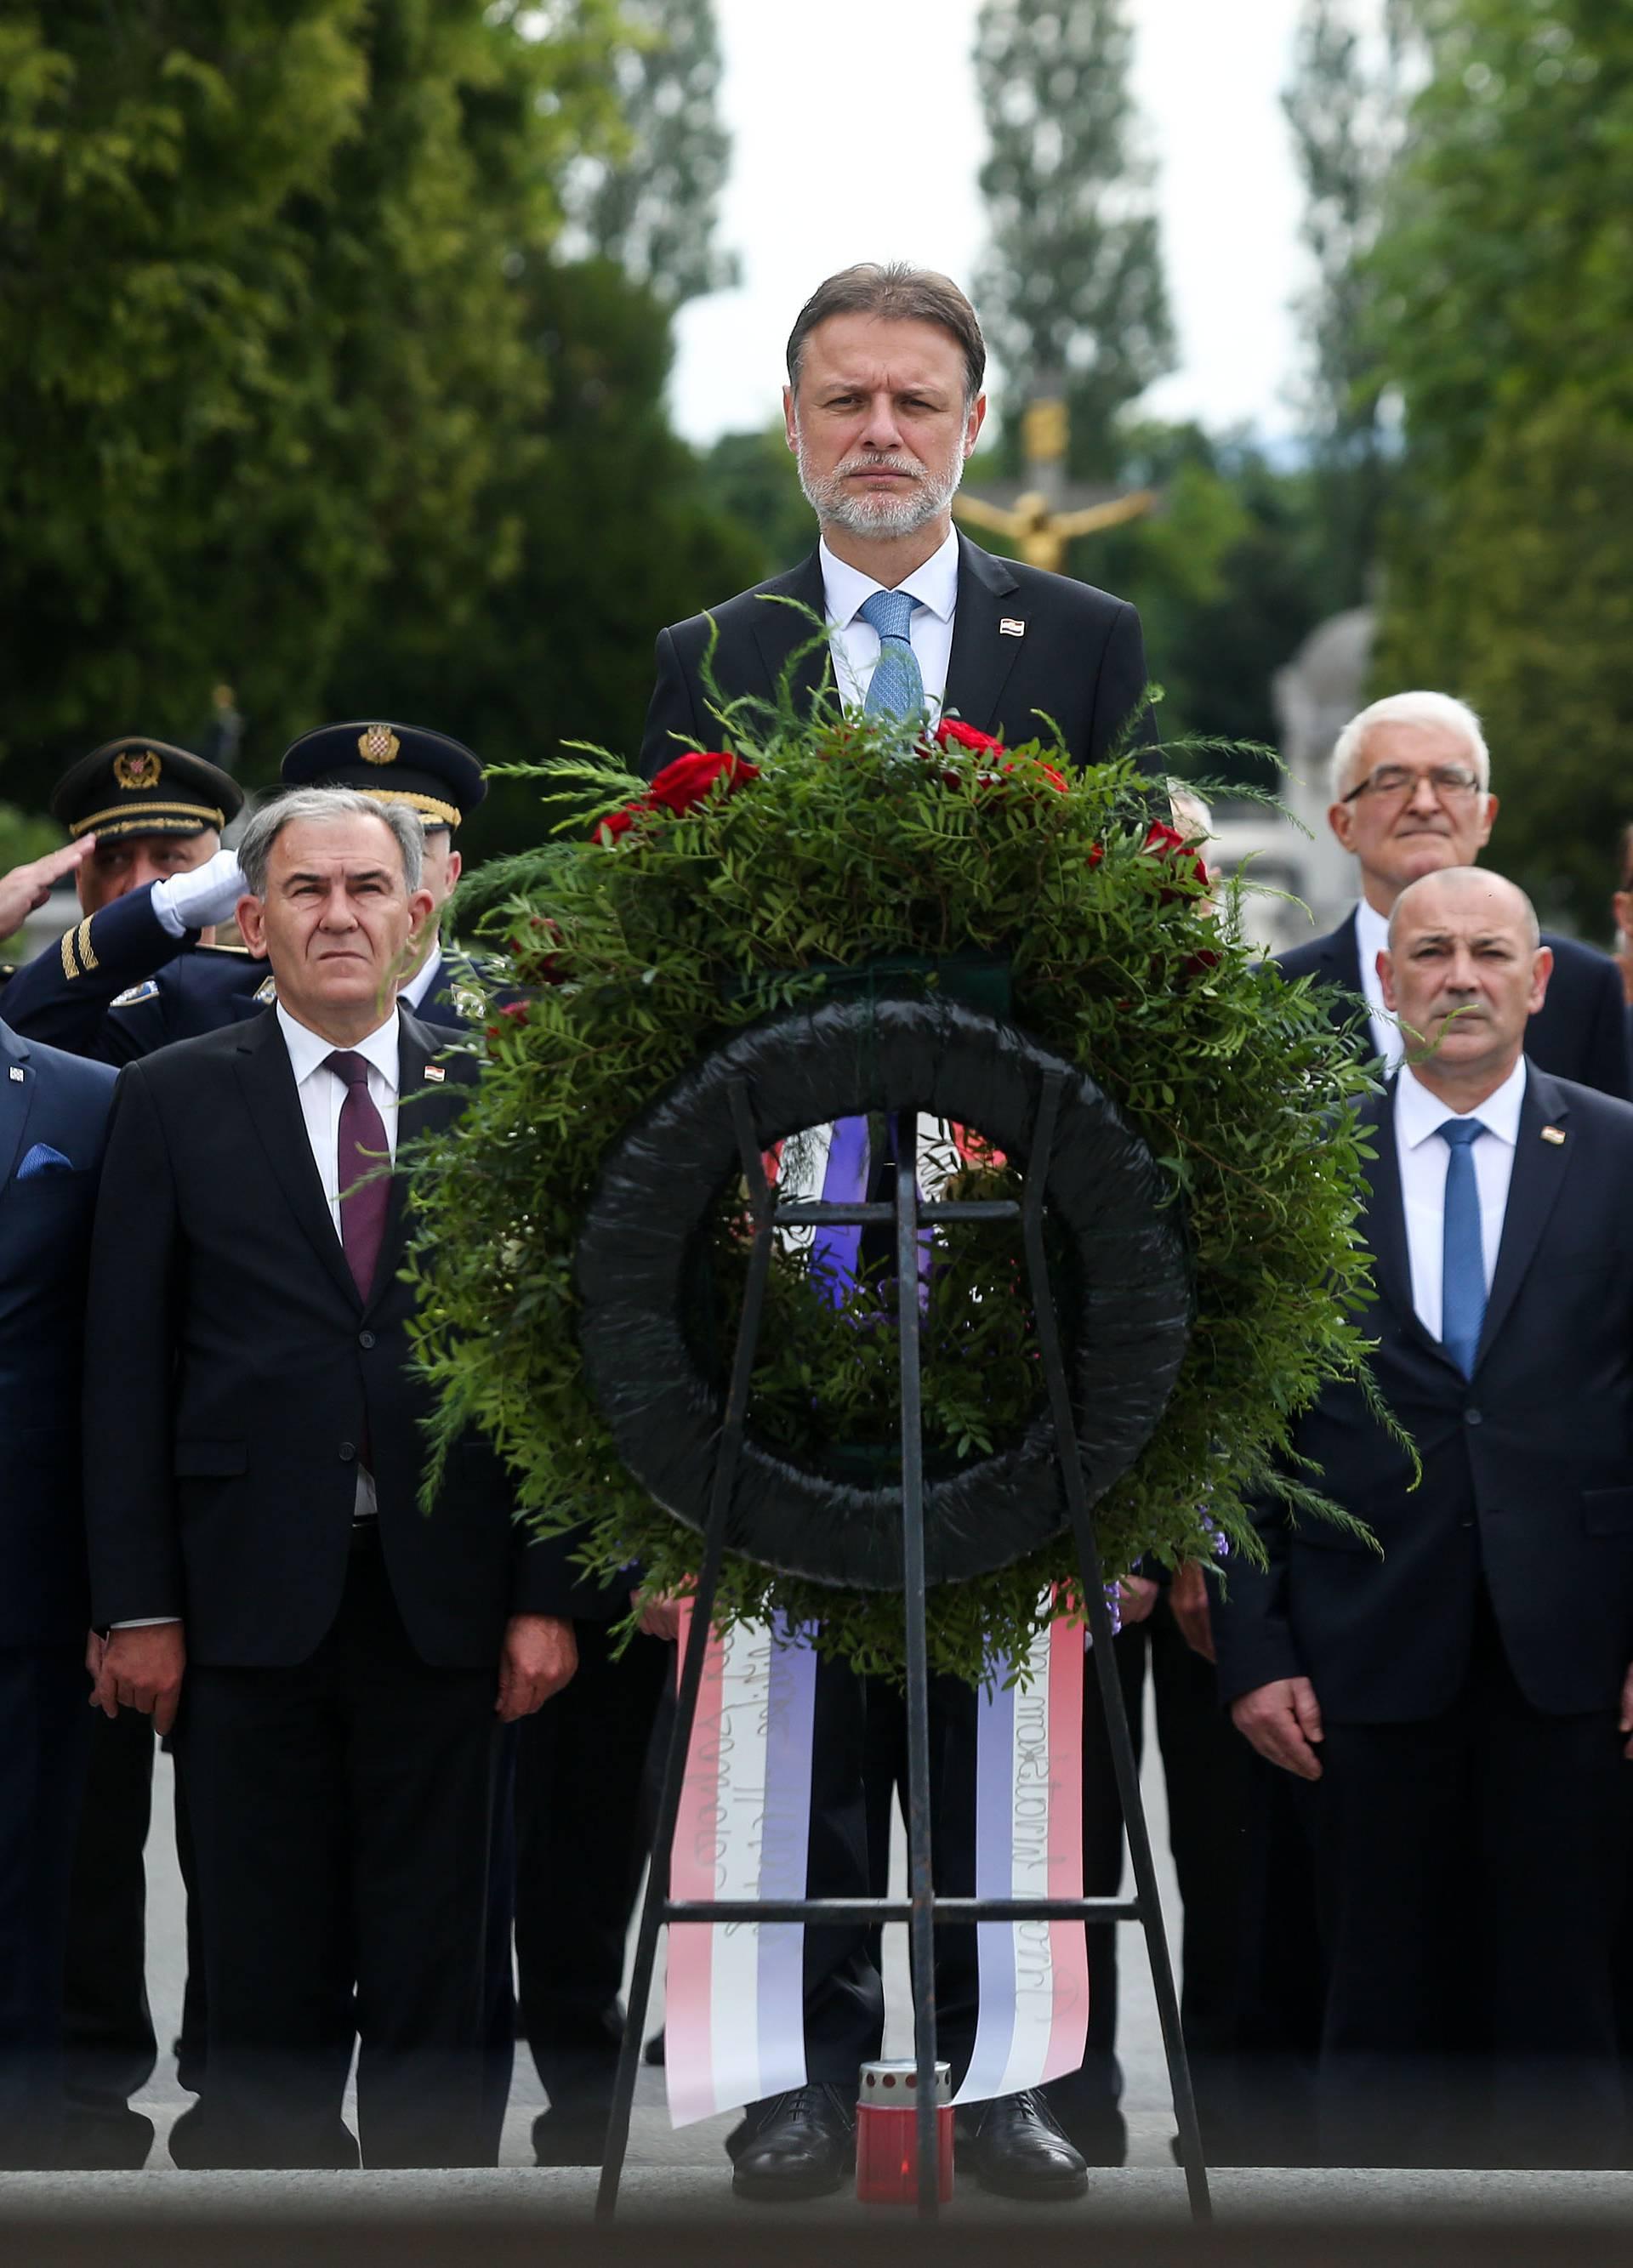 Zagreb: Na Dan državnosti državni vrh položio vijence na groblju Mirogoj